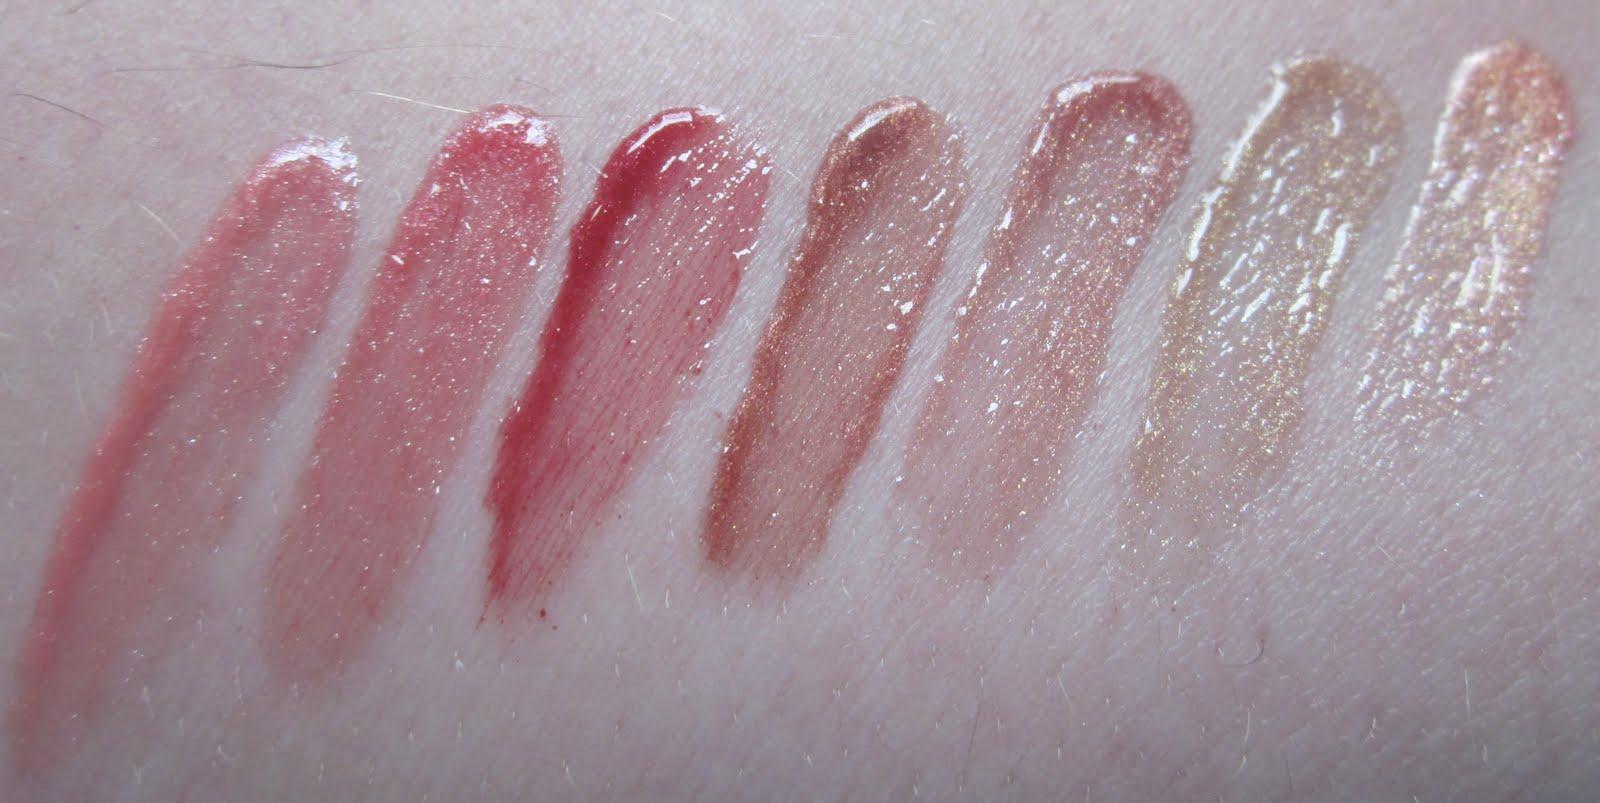 Lip Plumping Gloss by e.l.f. #15